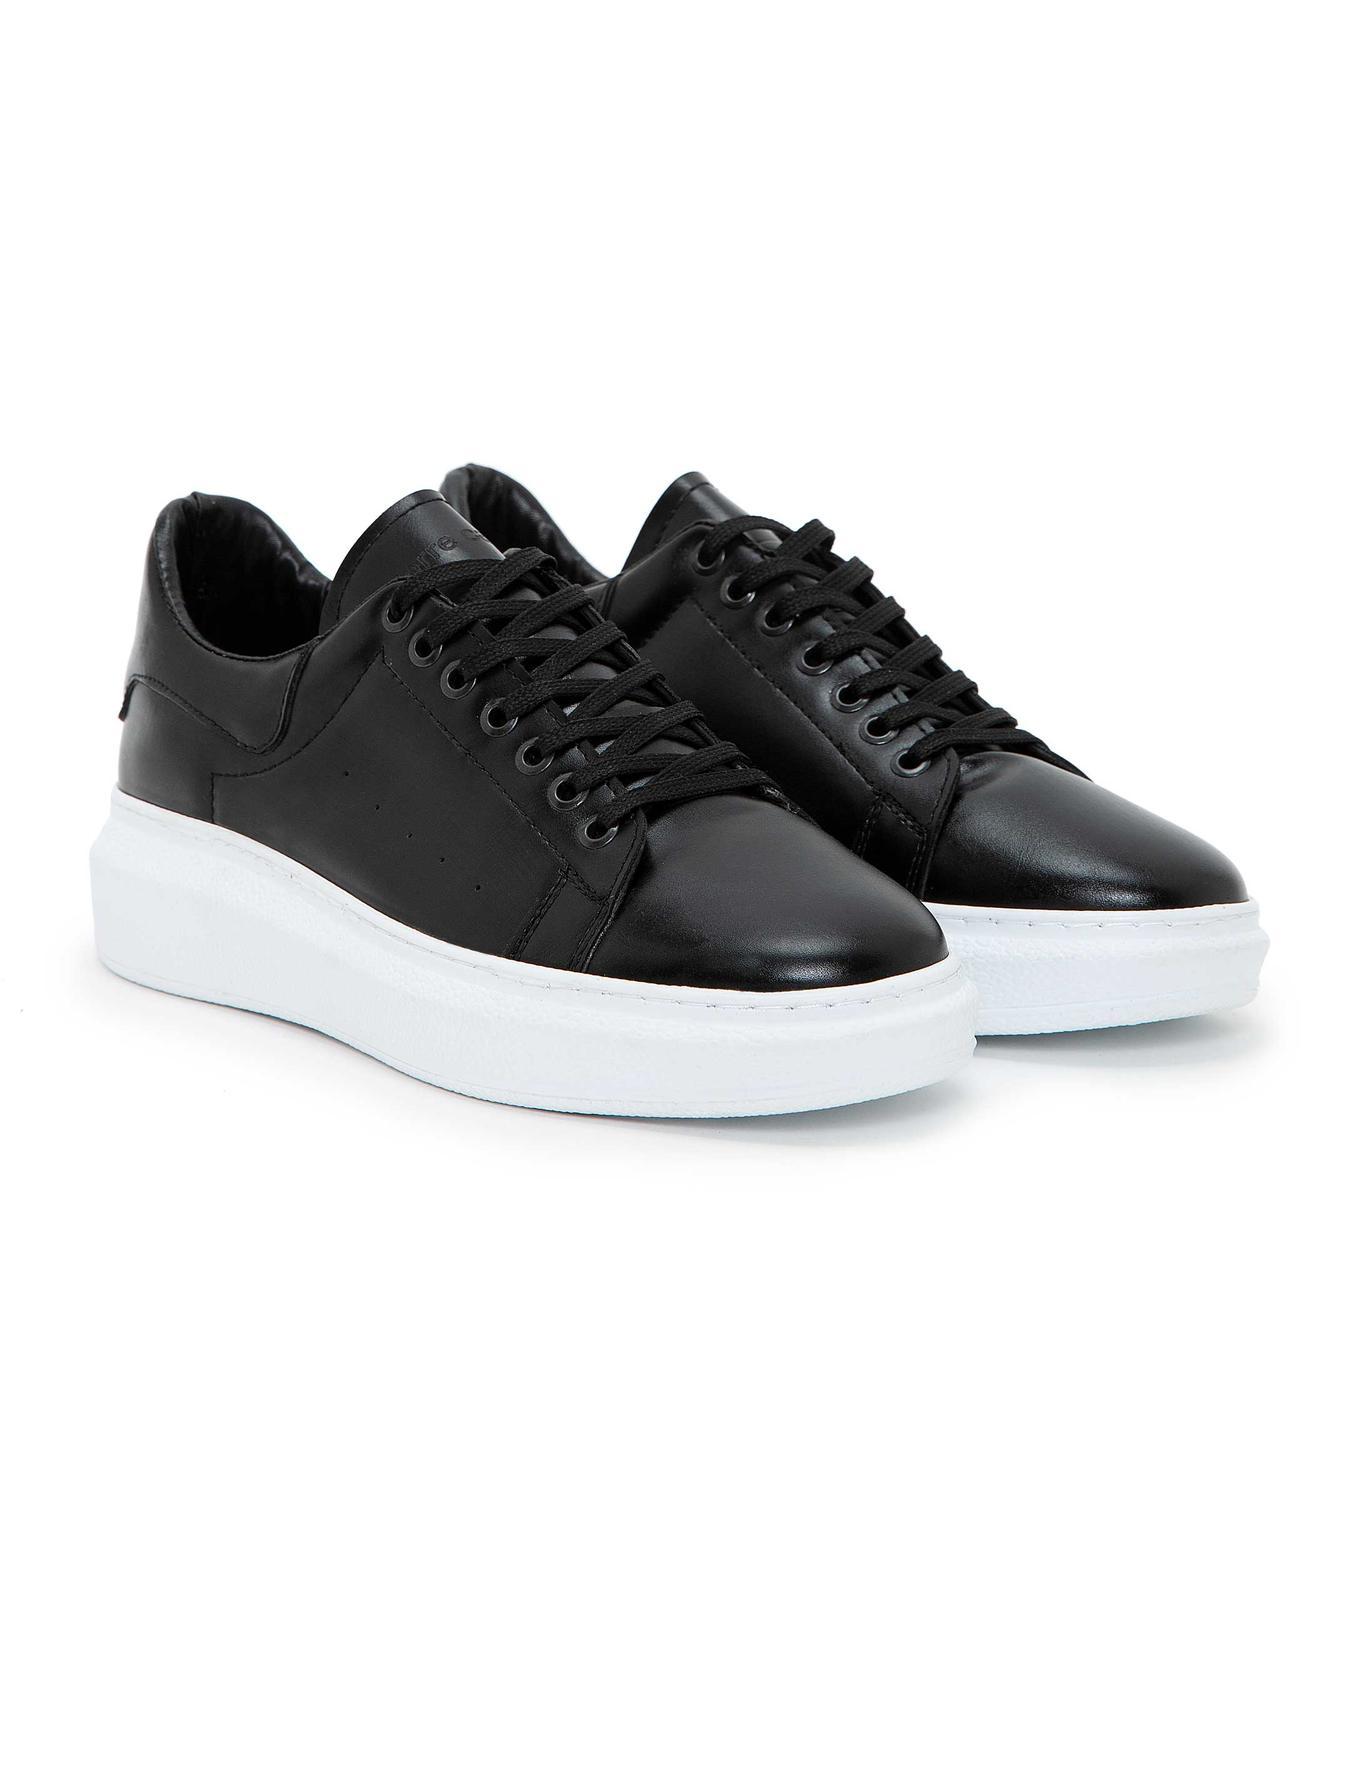 Siyah Sneakers Ayakkabı